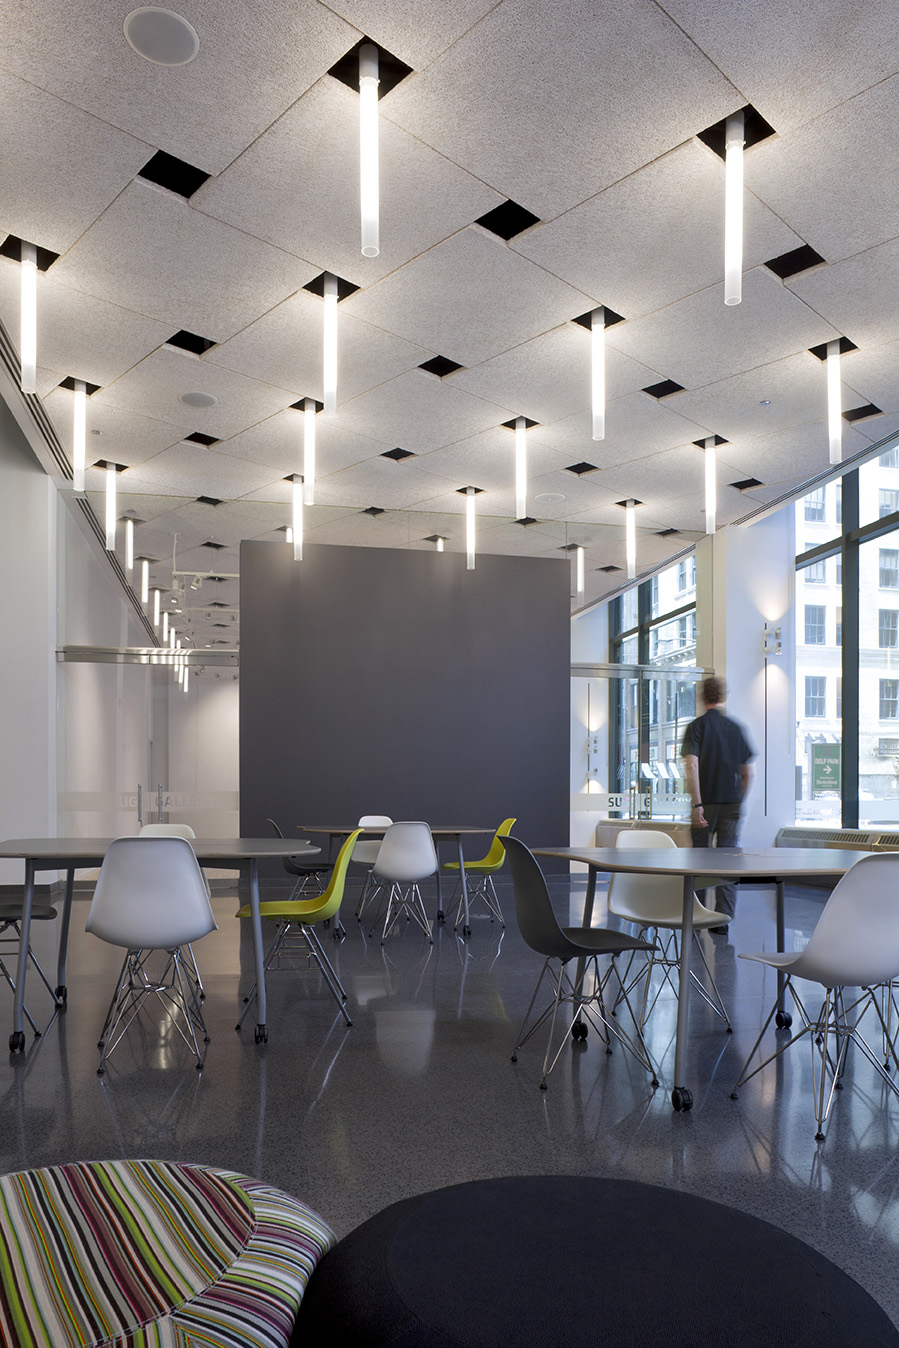 School of the Art Institute of Chicago Leroy Neiman Center